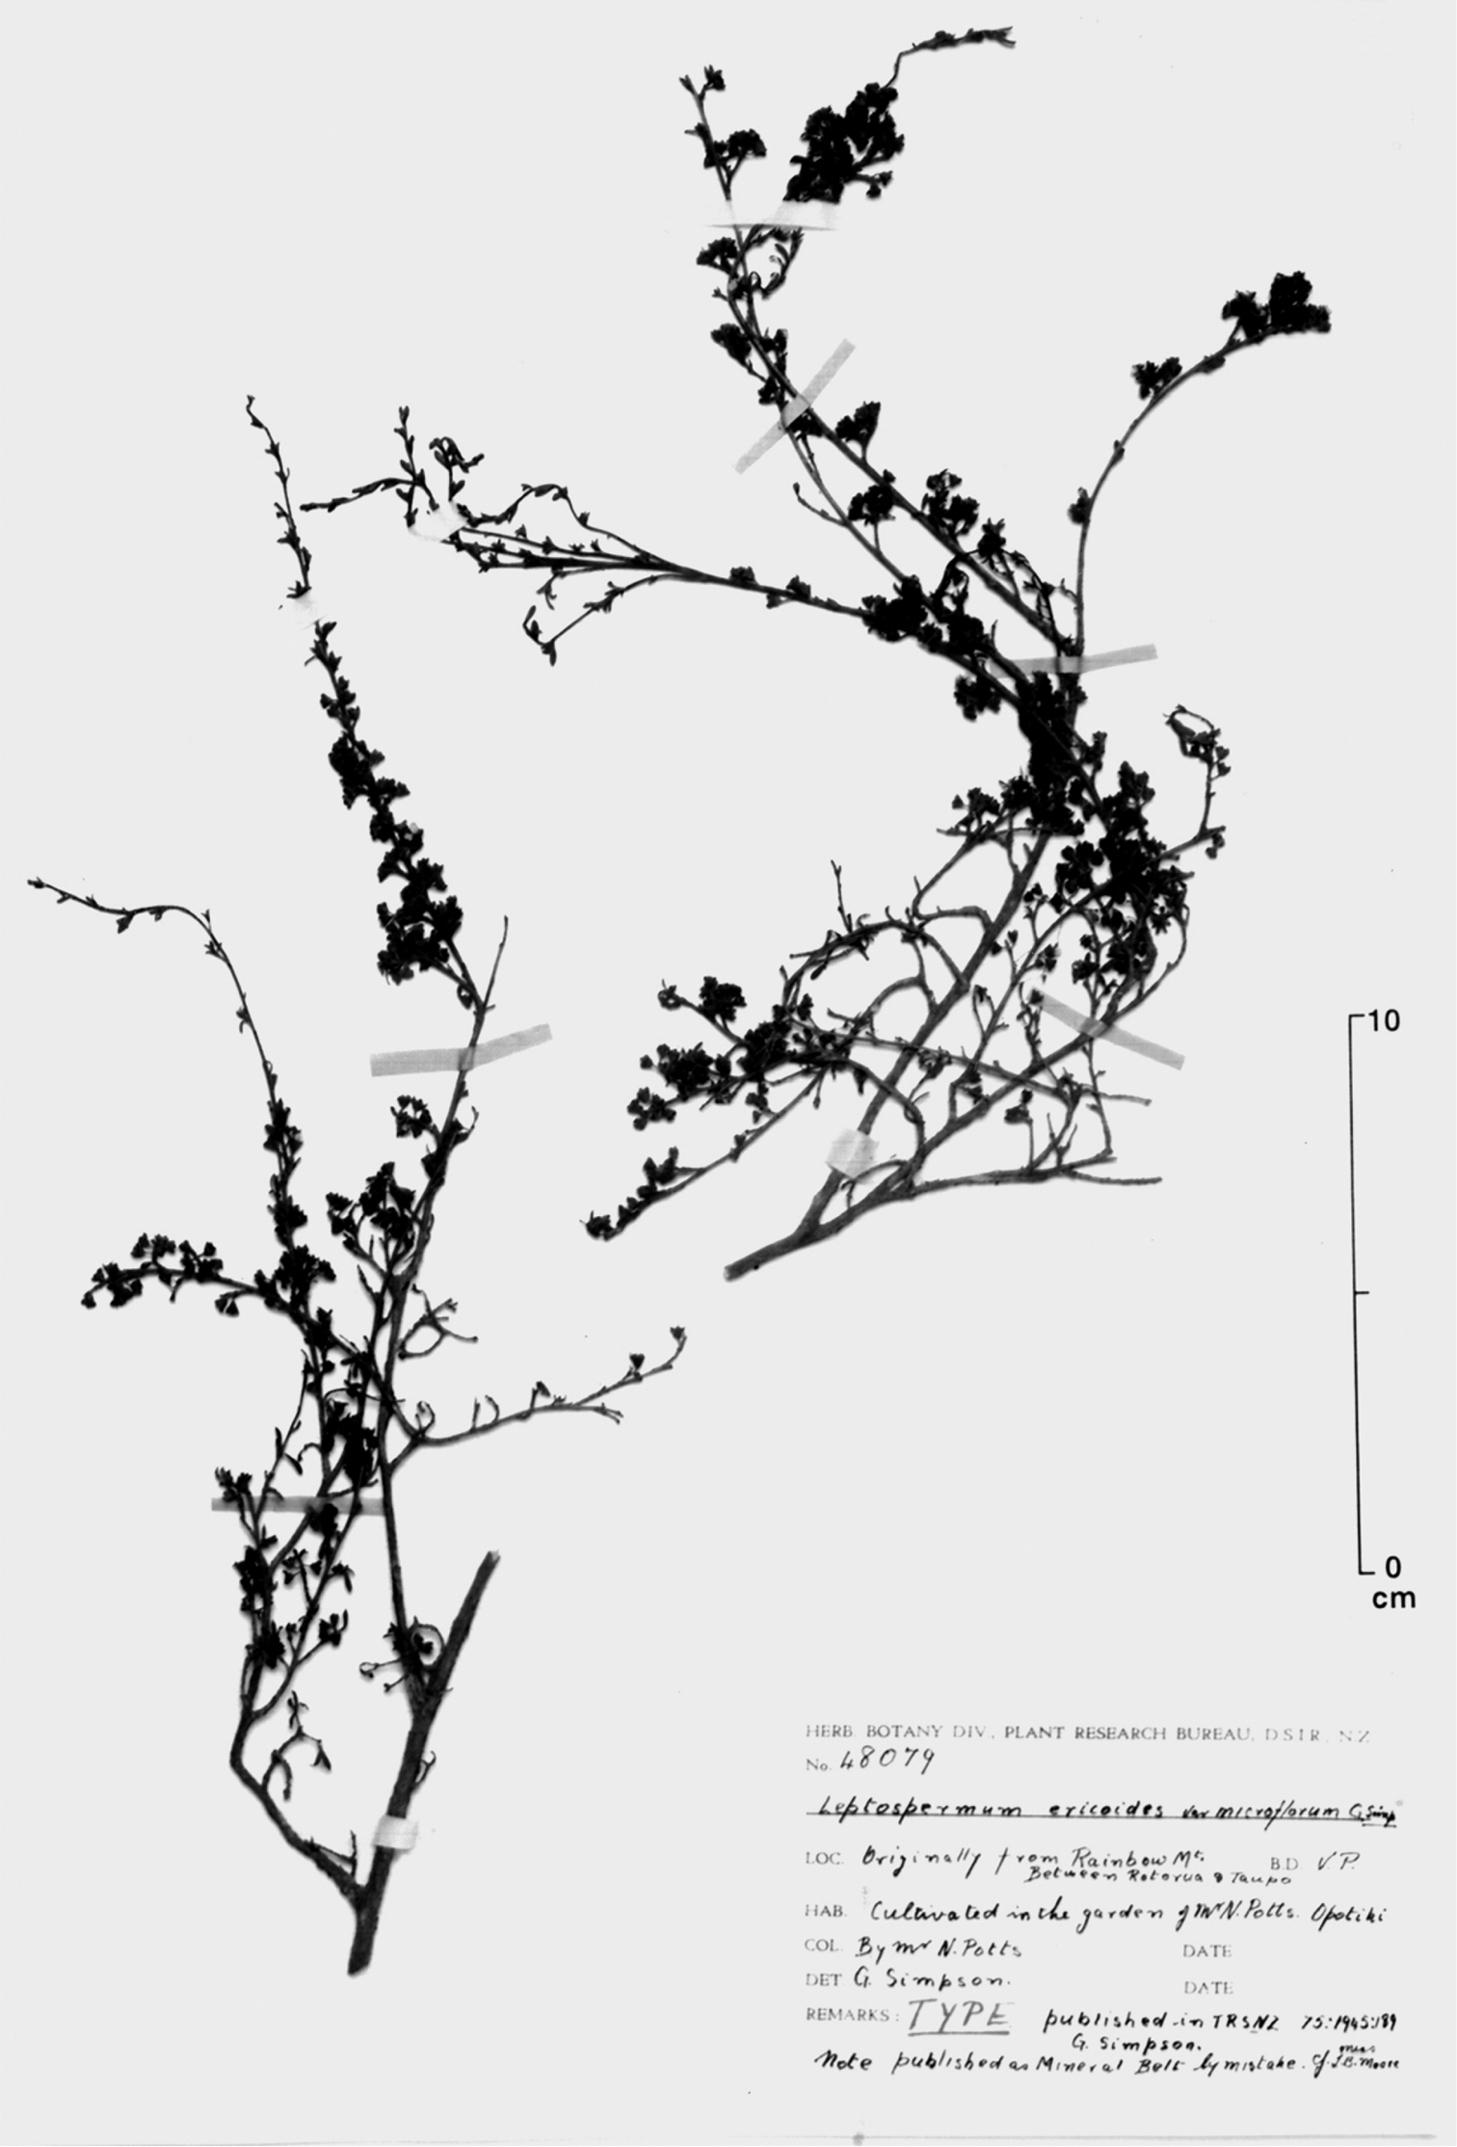 581.phytokeys 40 7973 sp 4 p 5